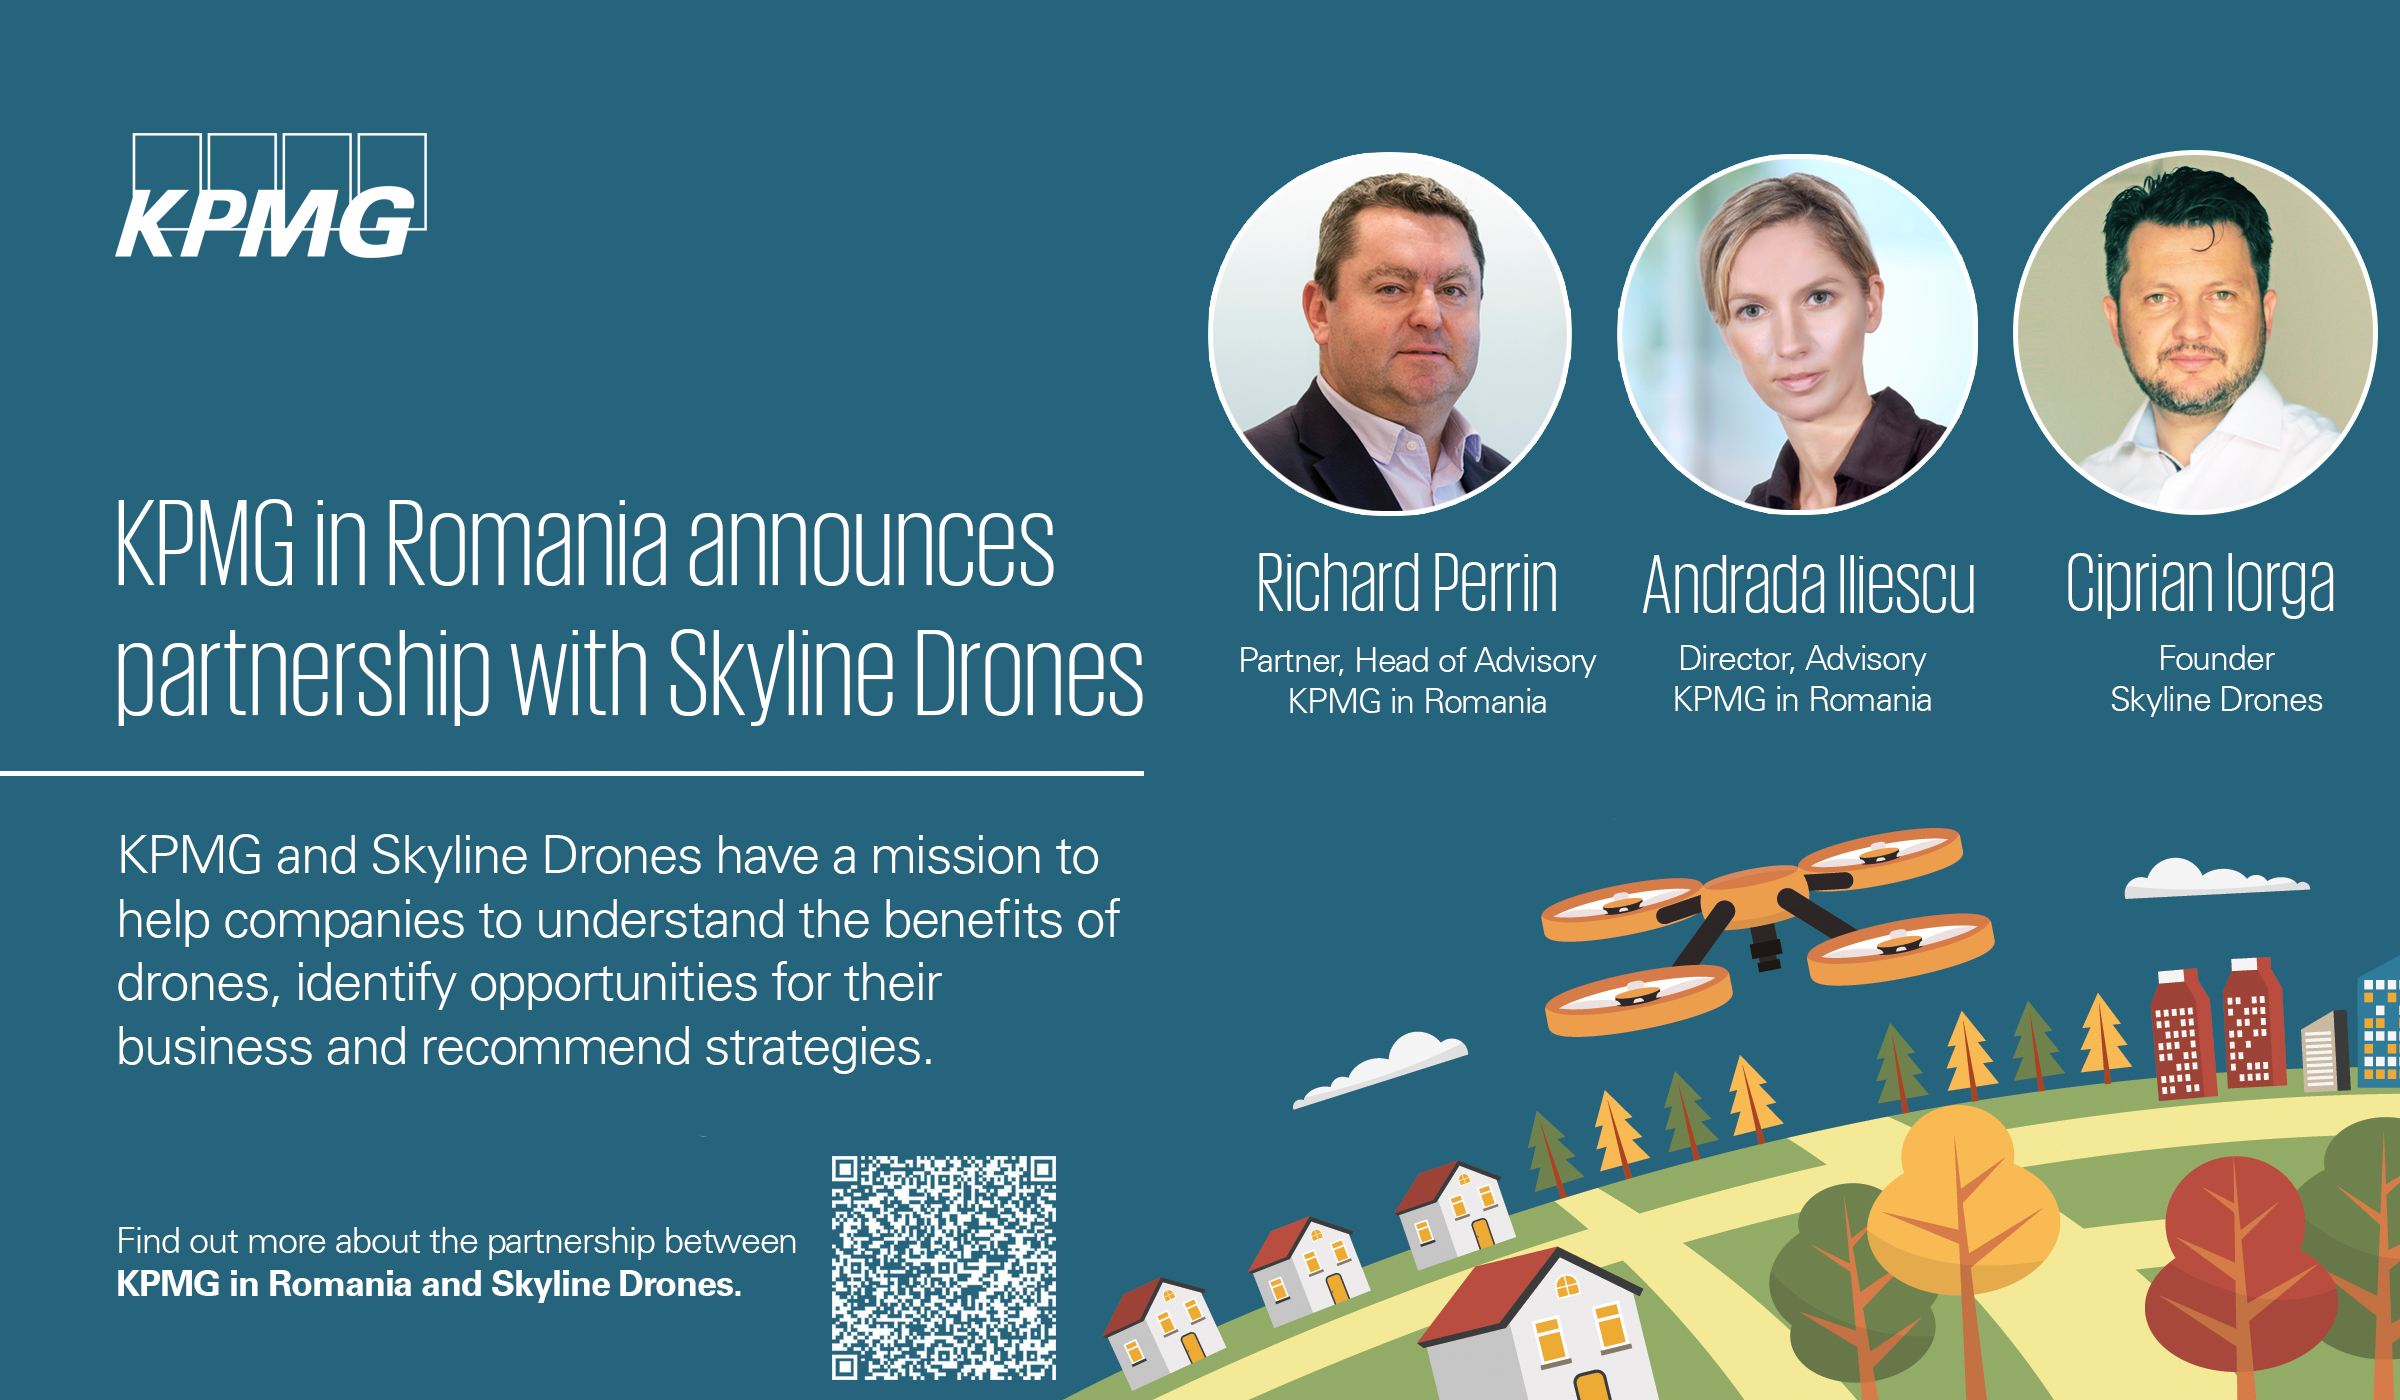 KPMG a încheiat un parteneriat cu Skyline Drones